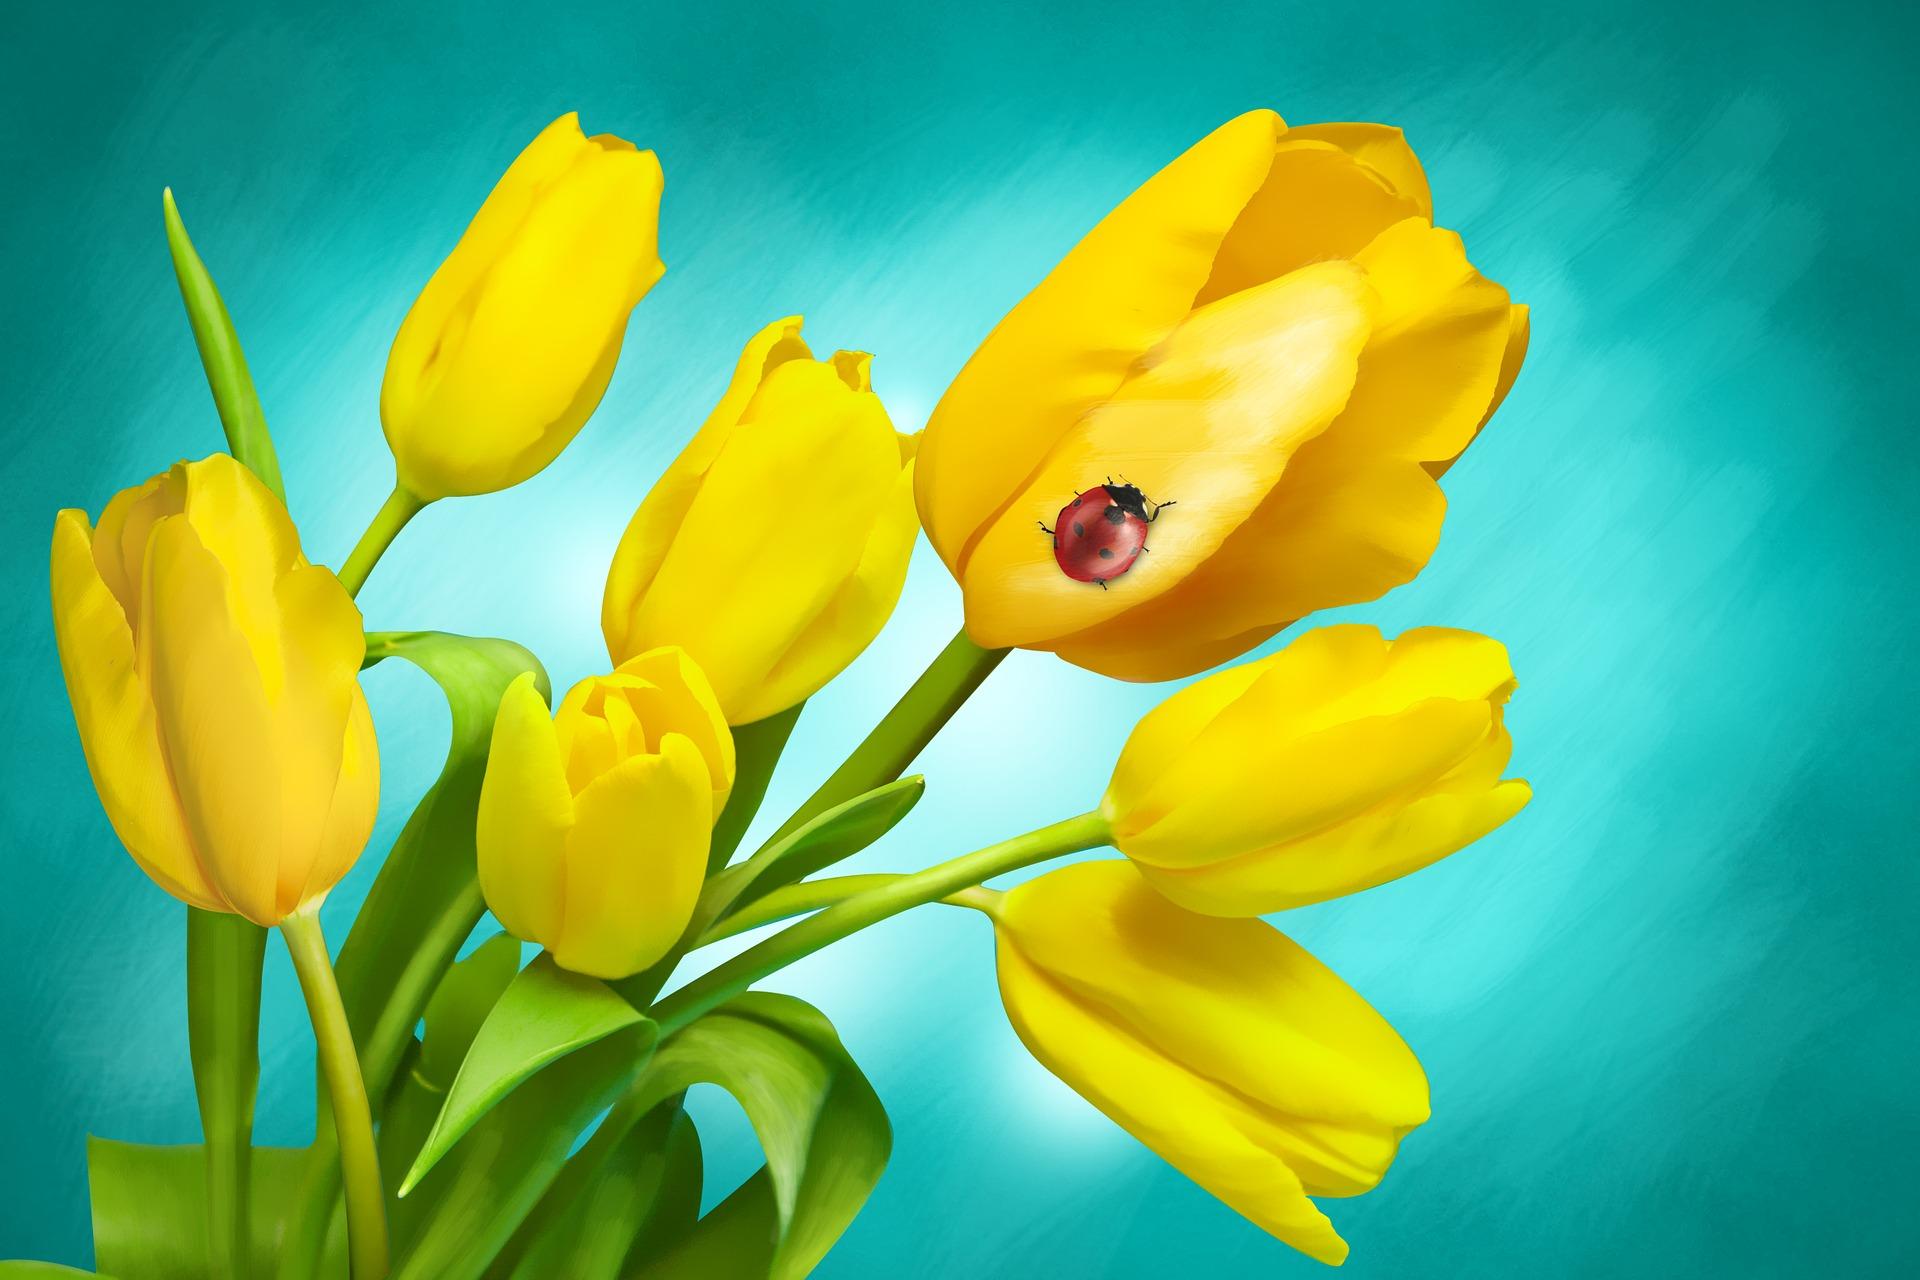 flowers-1018499_1920